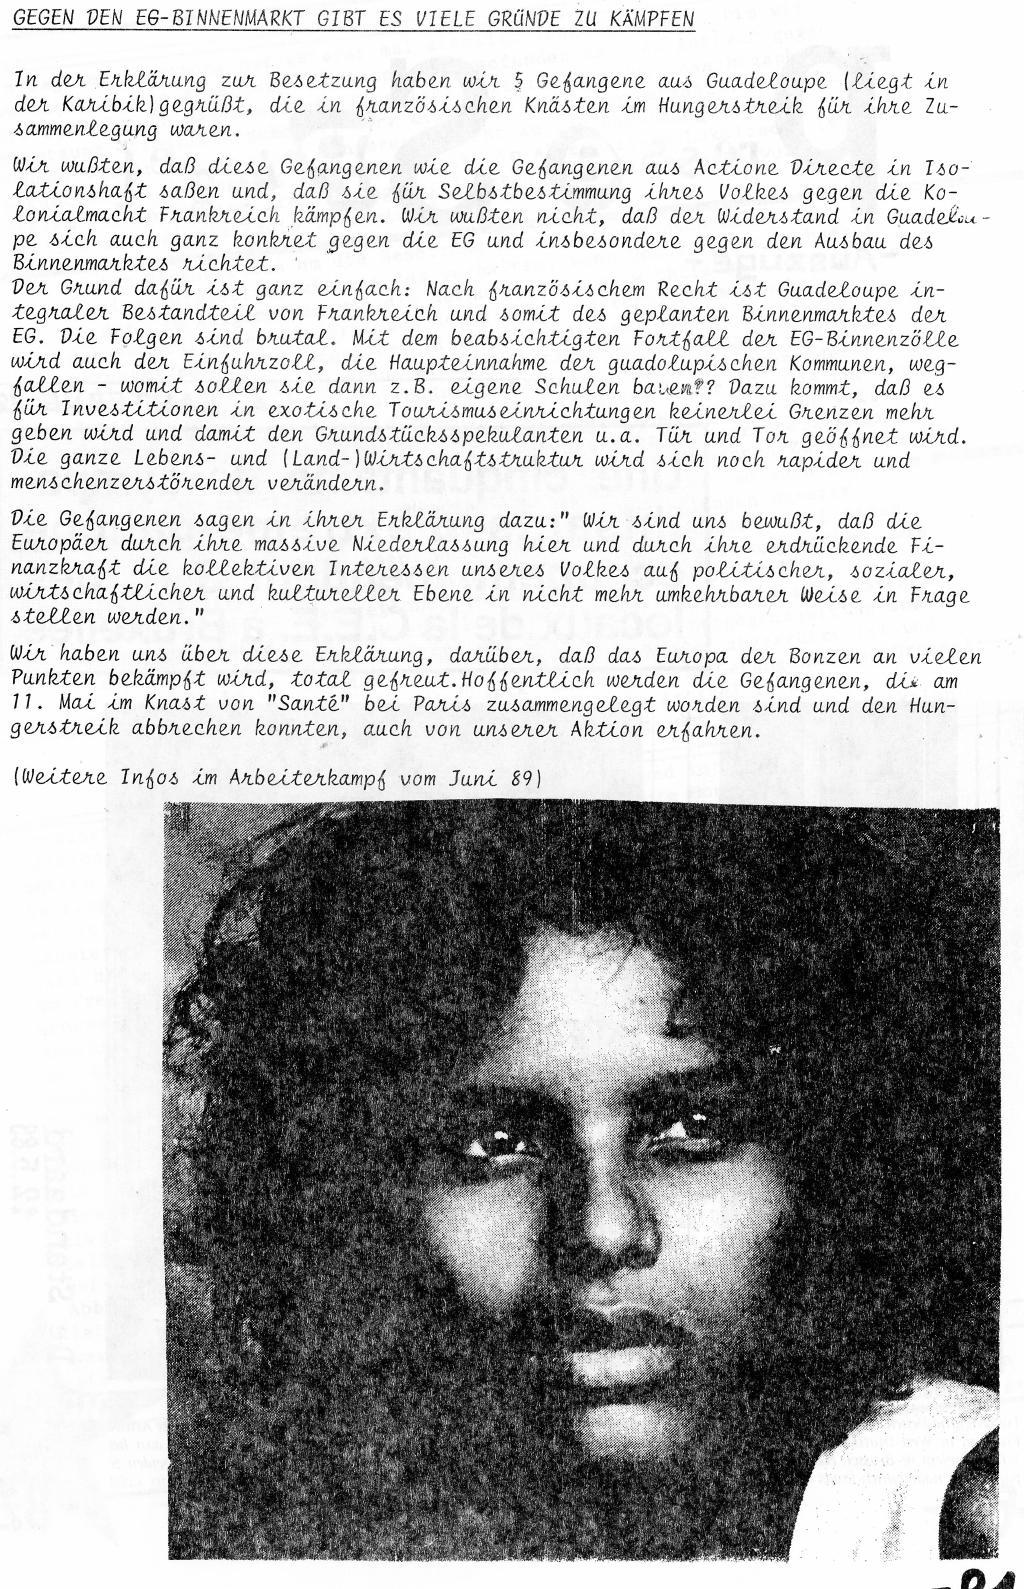 Belgien_Doku_Besetzung_EG_Kommission_1989_083